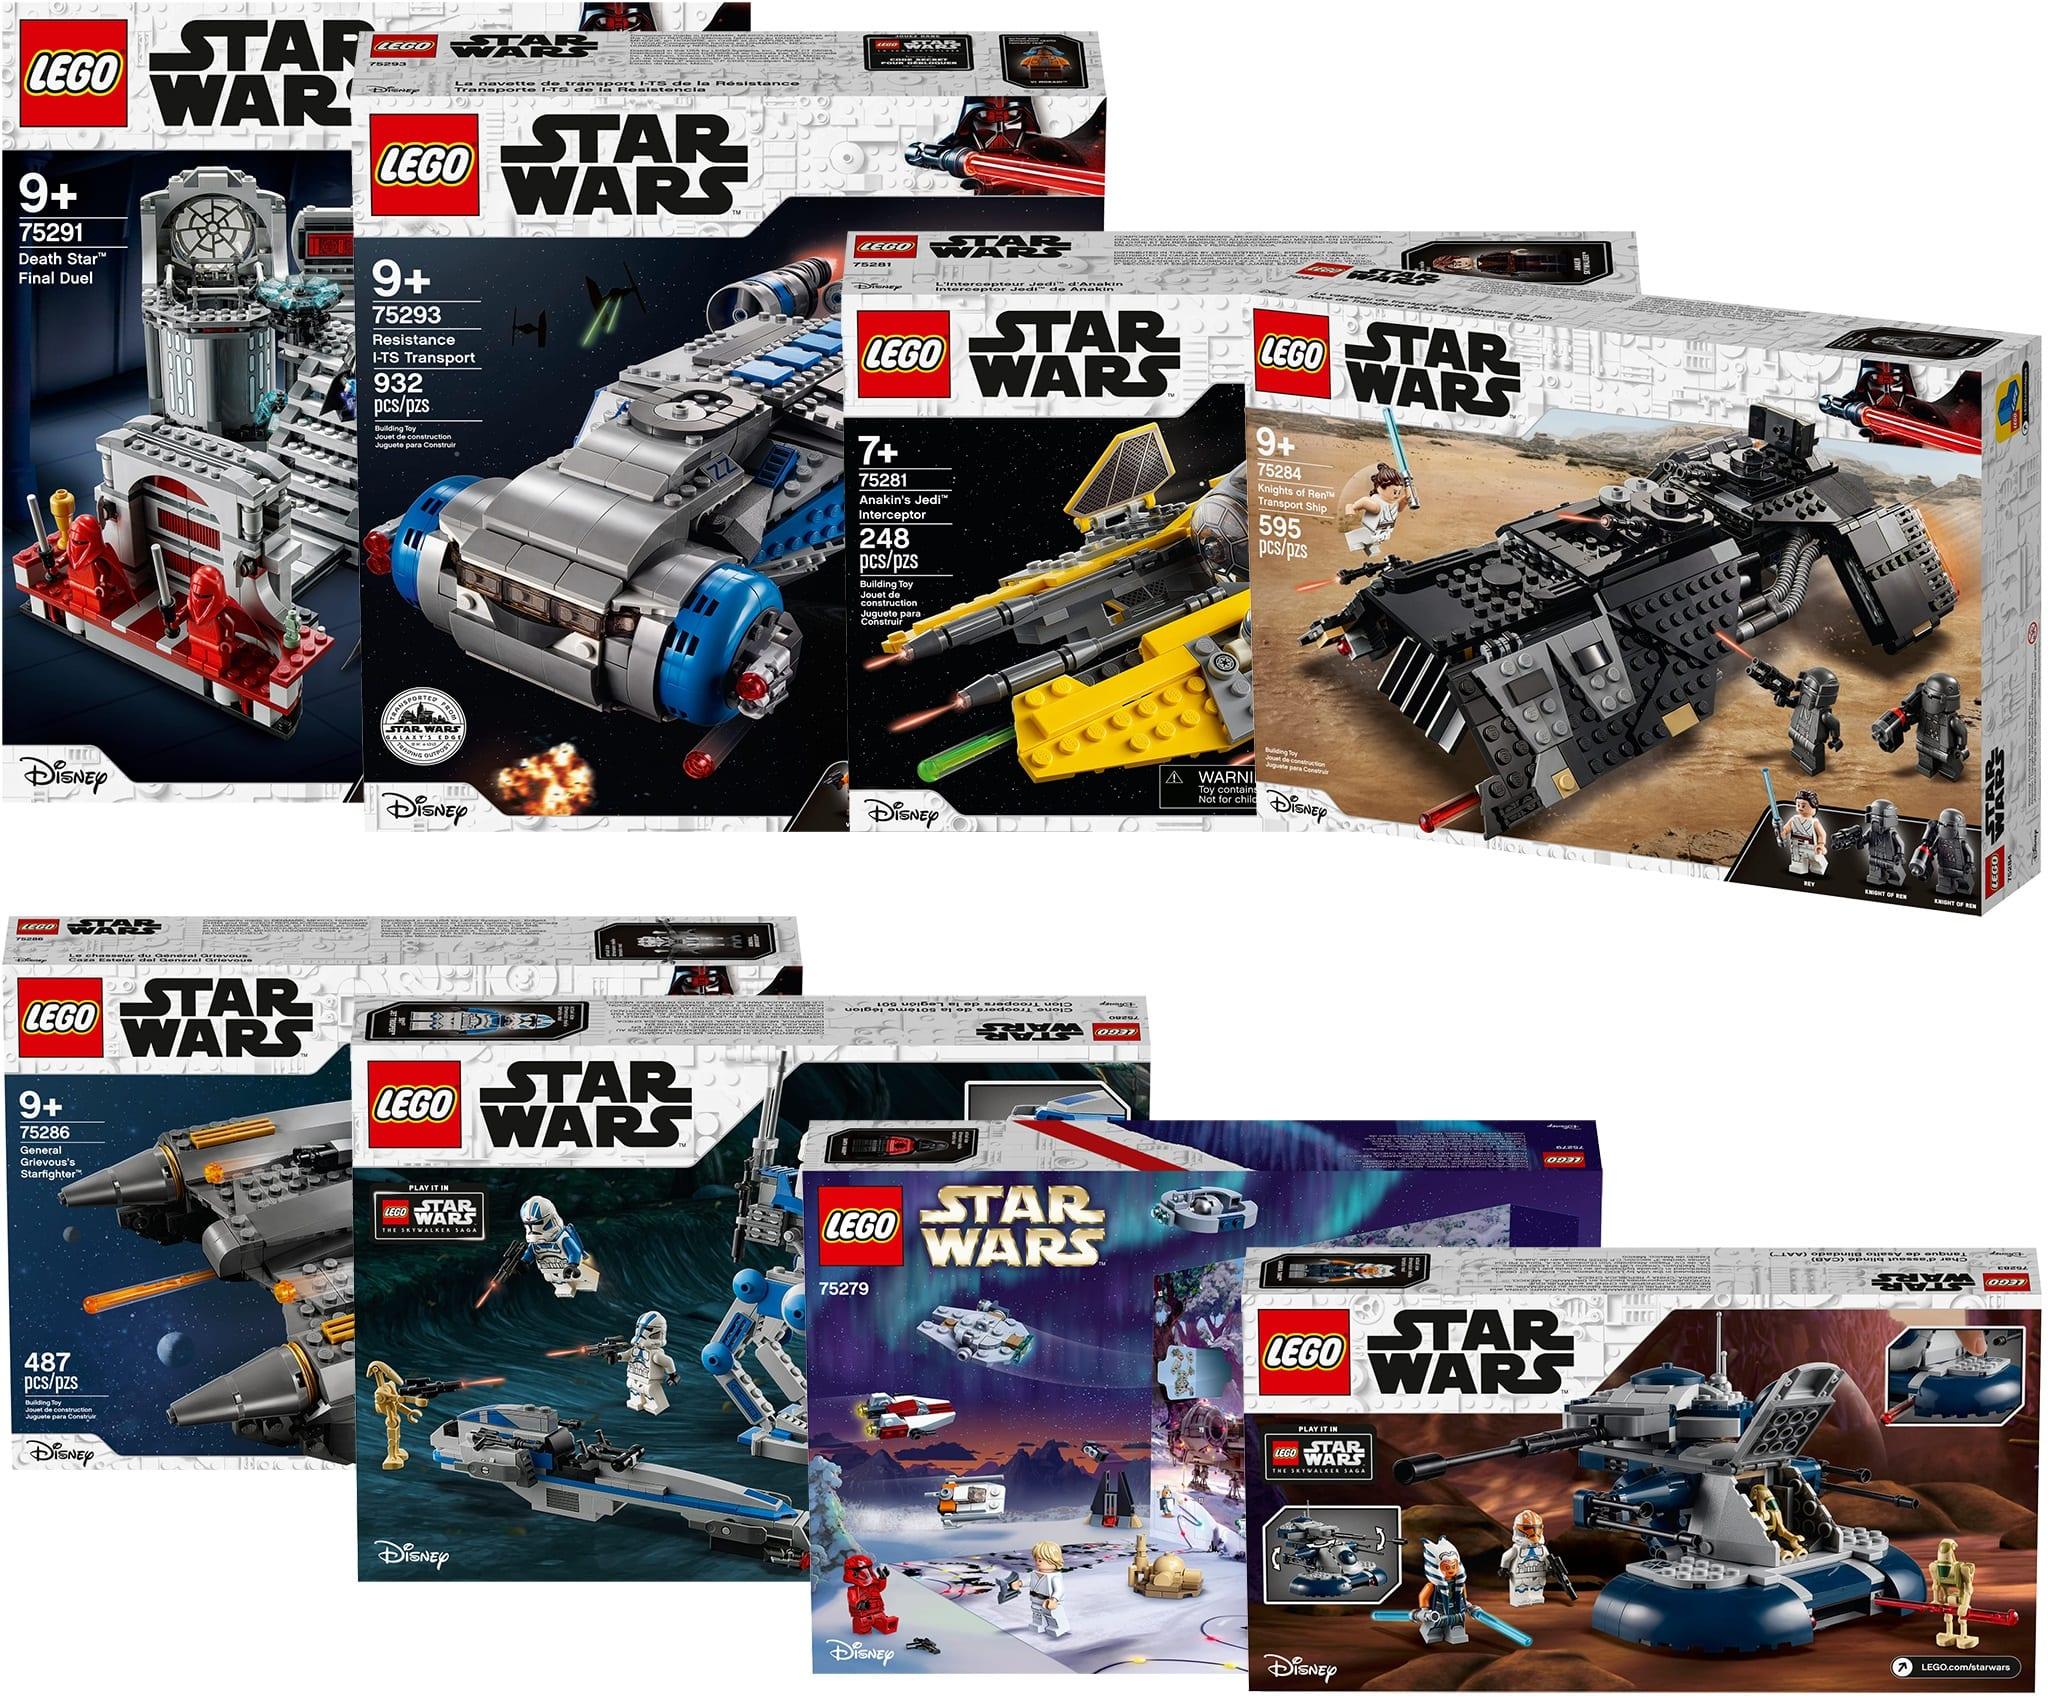 Sack Zaino Open nuovo New Beige Scuro,Dark Tan 2 X LEGO 92590 Borsa A Schiena